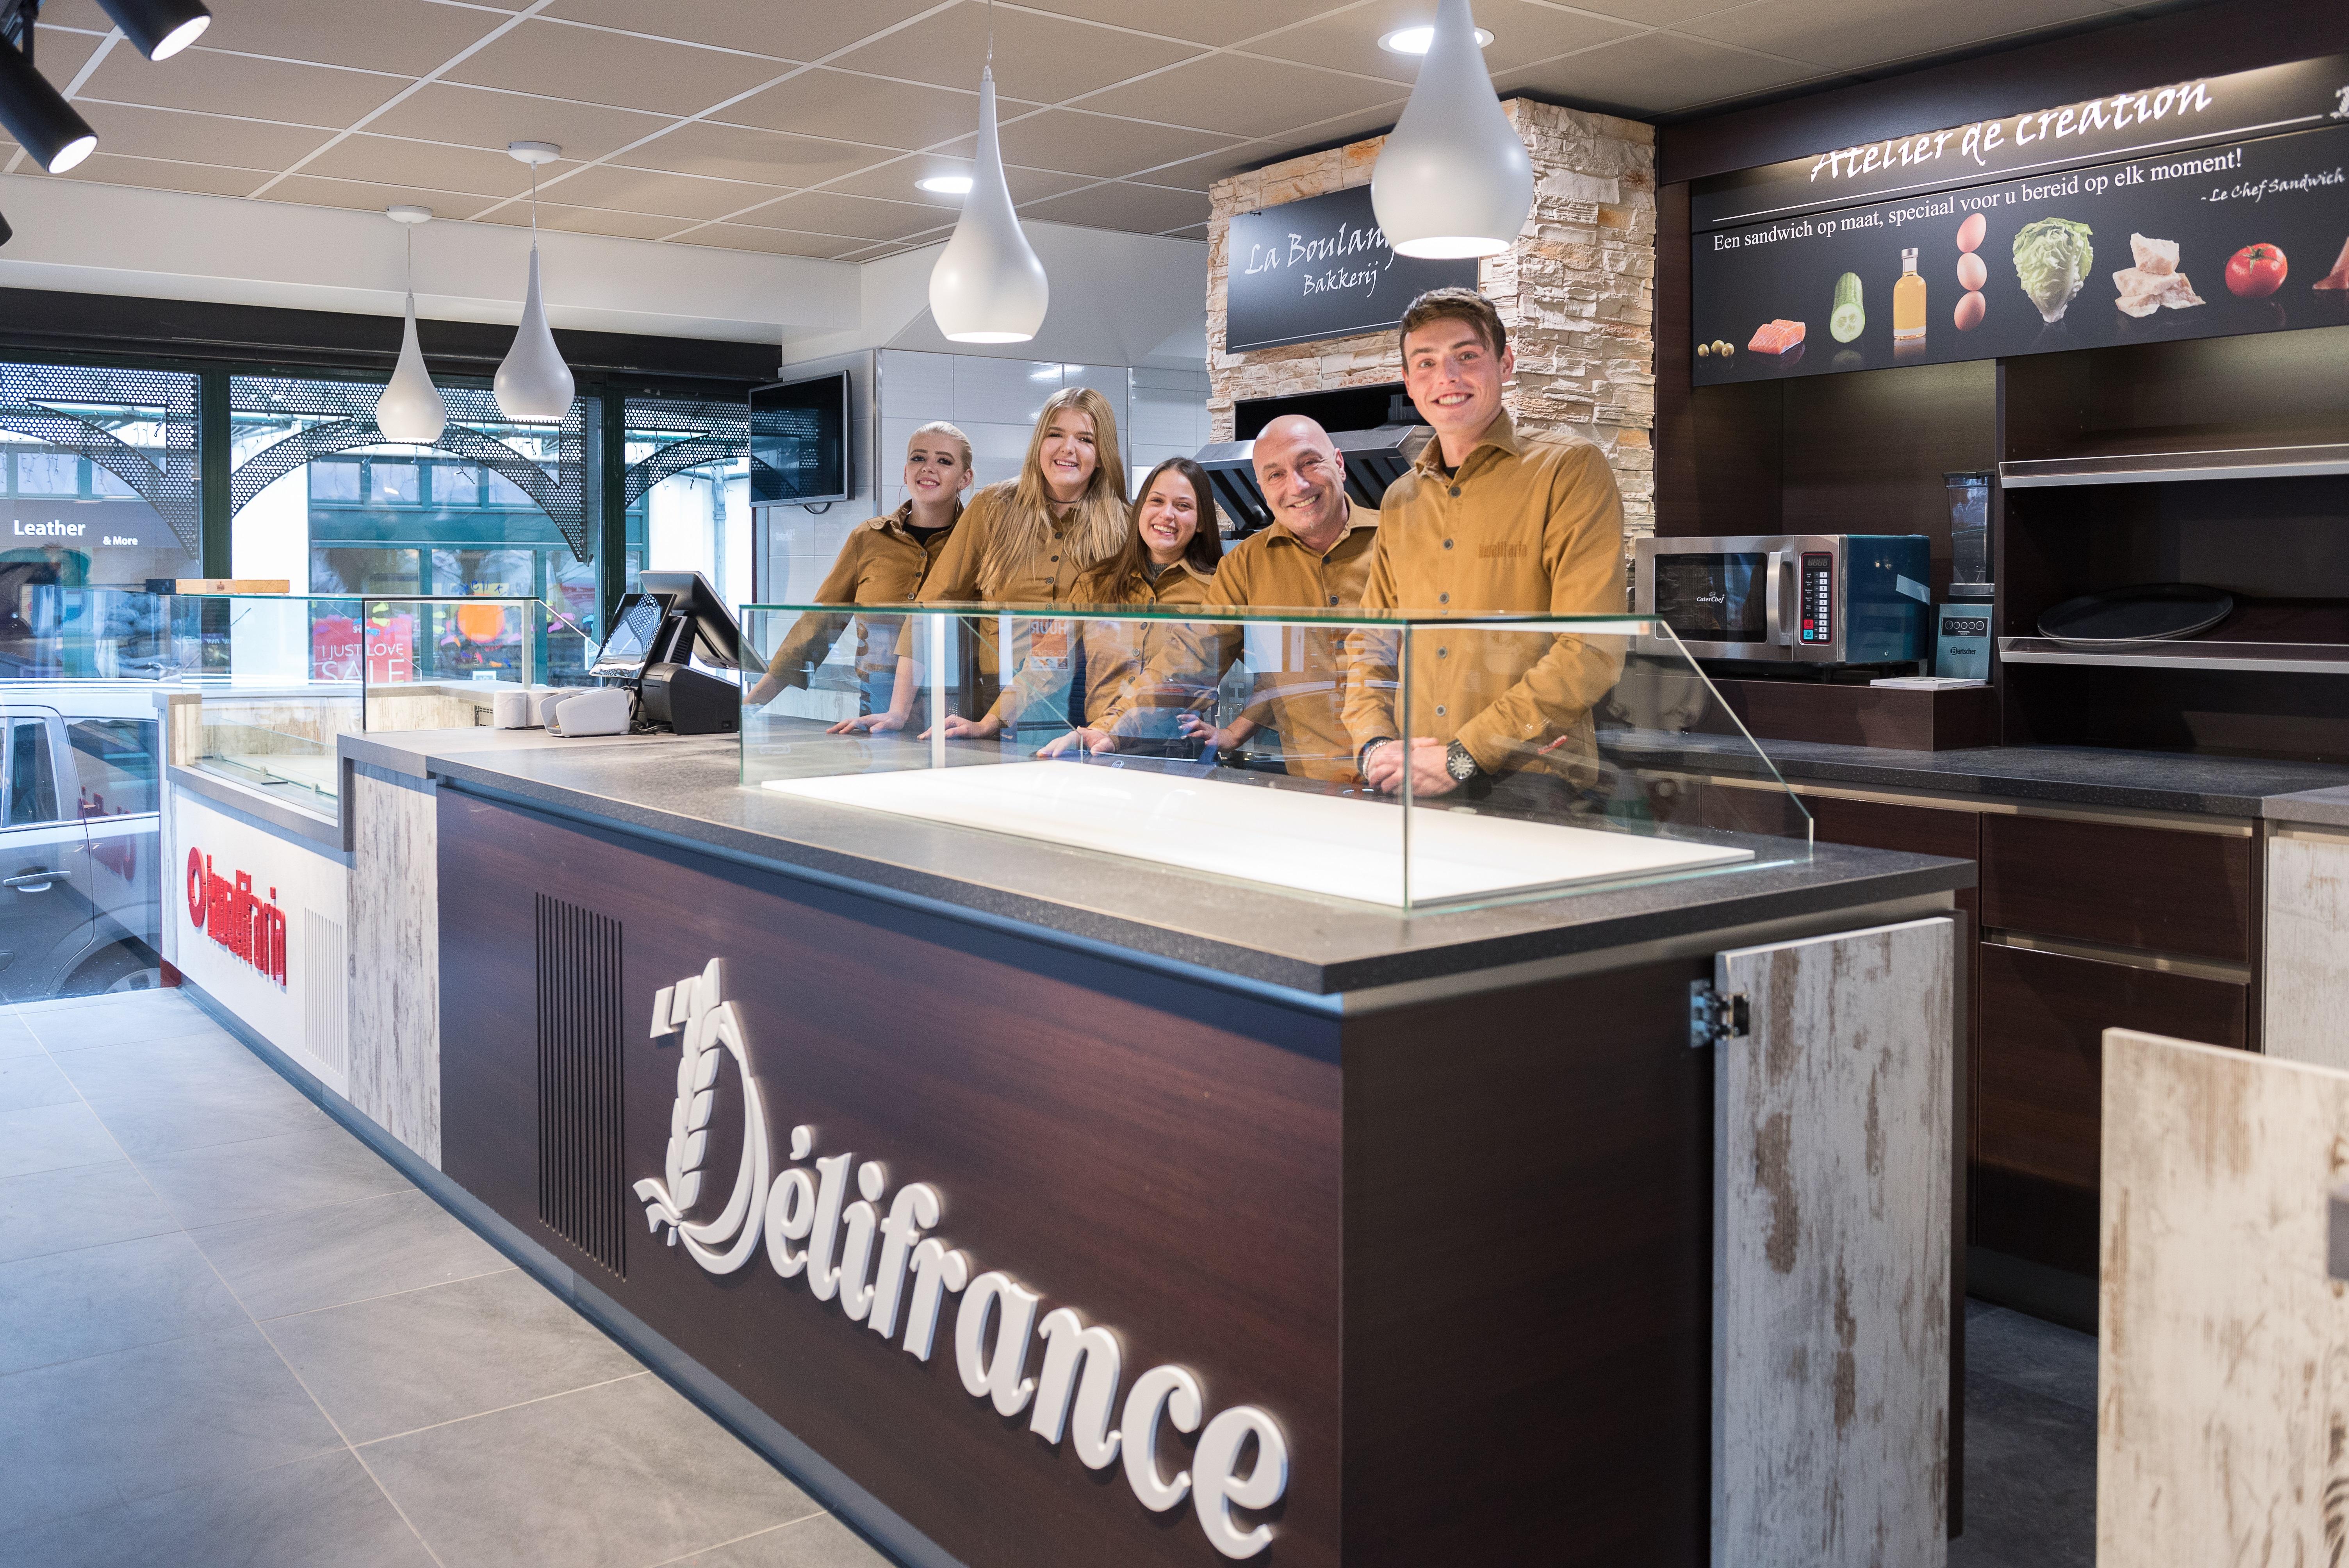 Het team van Kwalitaria-Delifrance Wassenaar. Bron: FranchiseFormules.NL